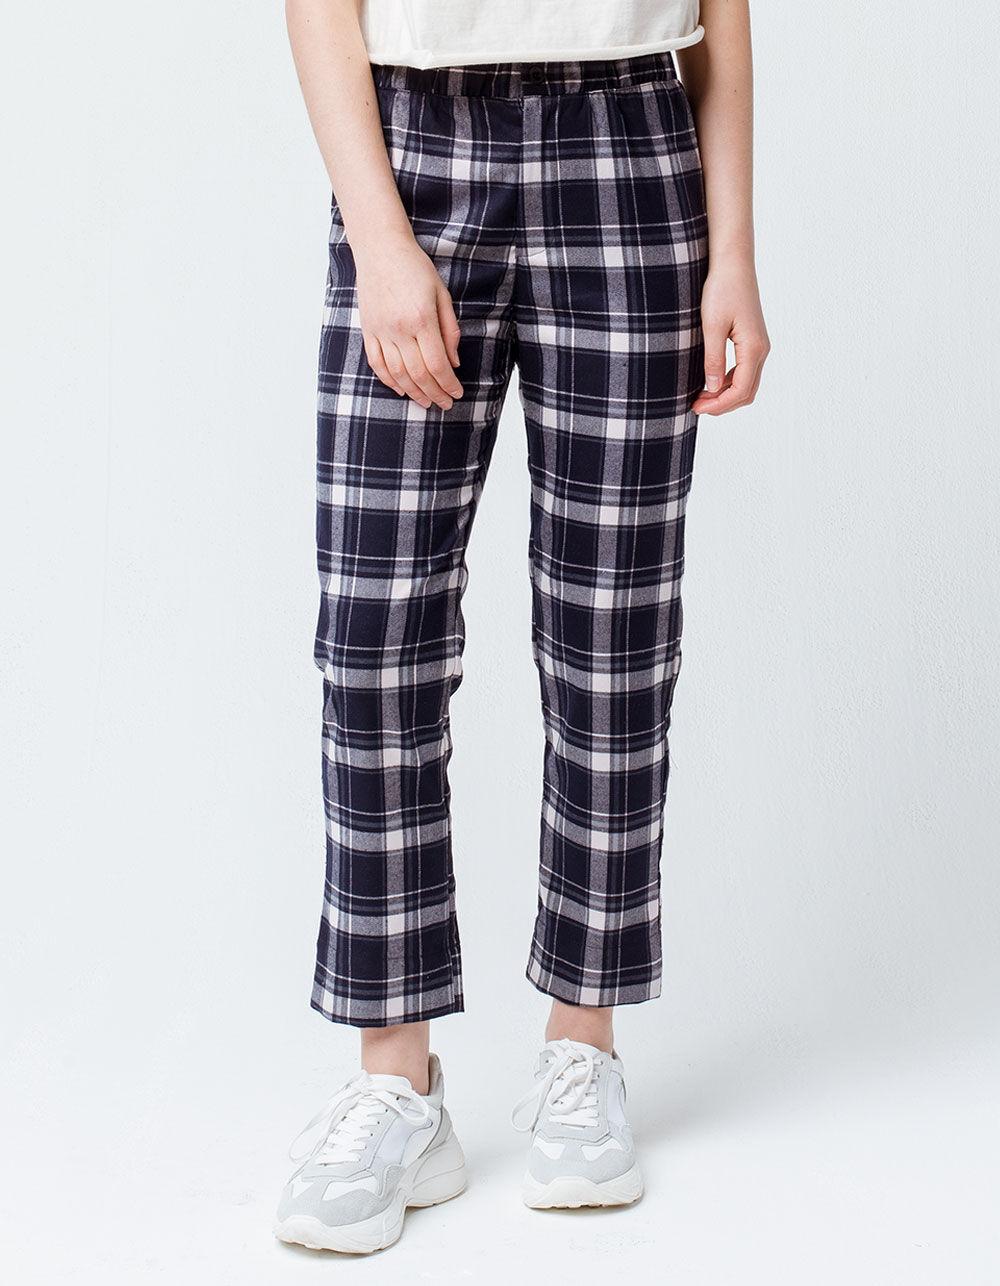 SKY AND SPARROW Plaid Crop Trouser Pants